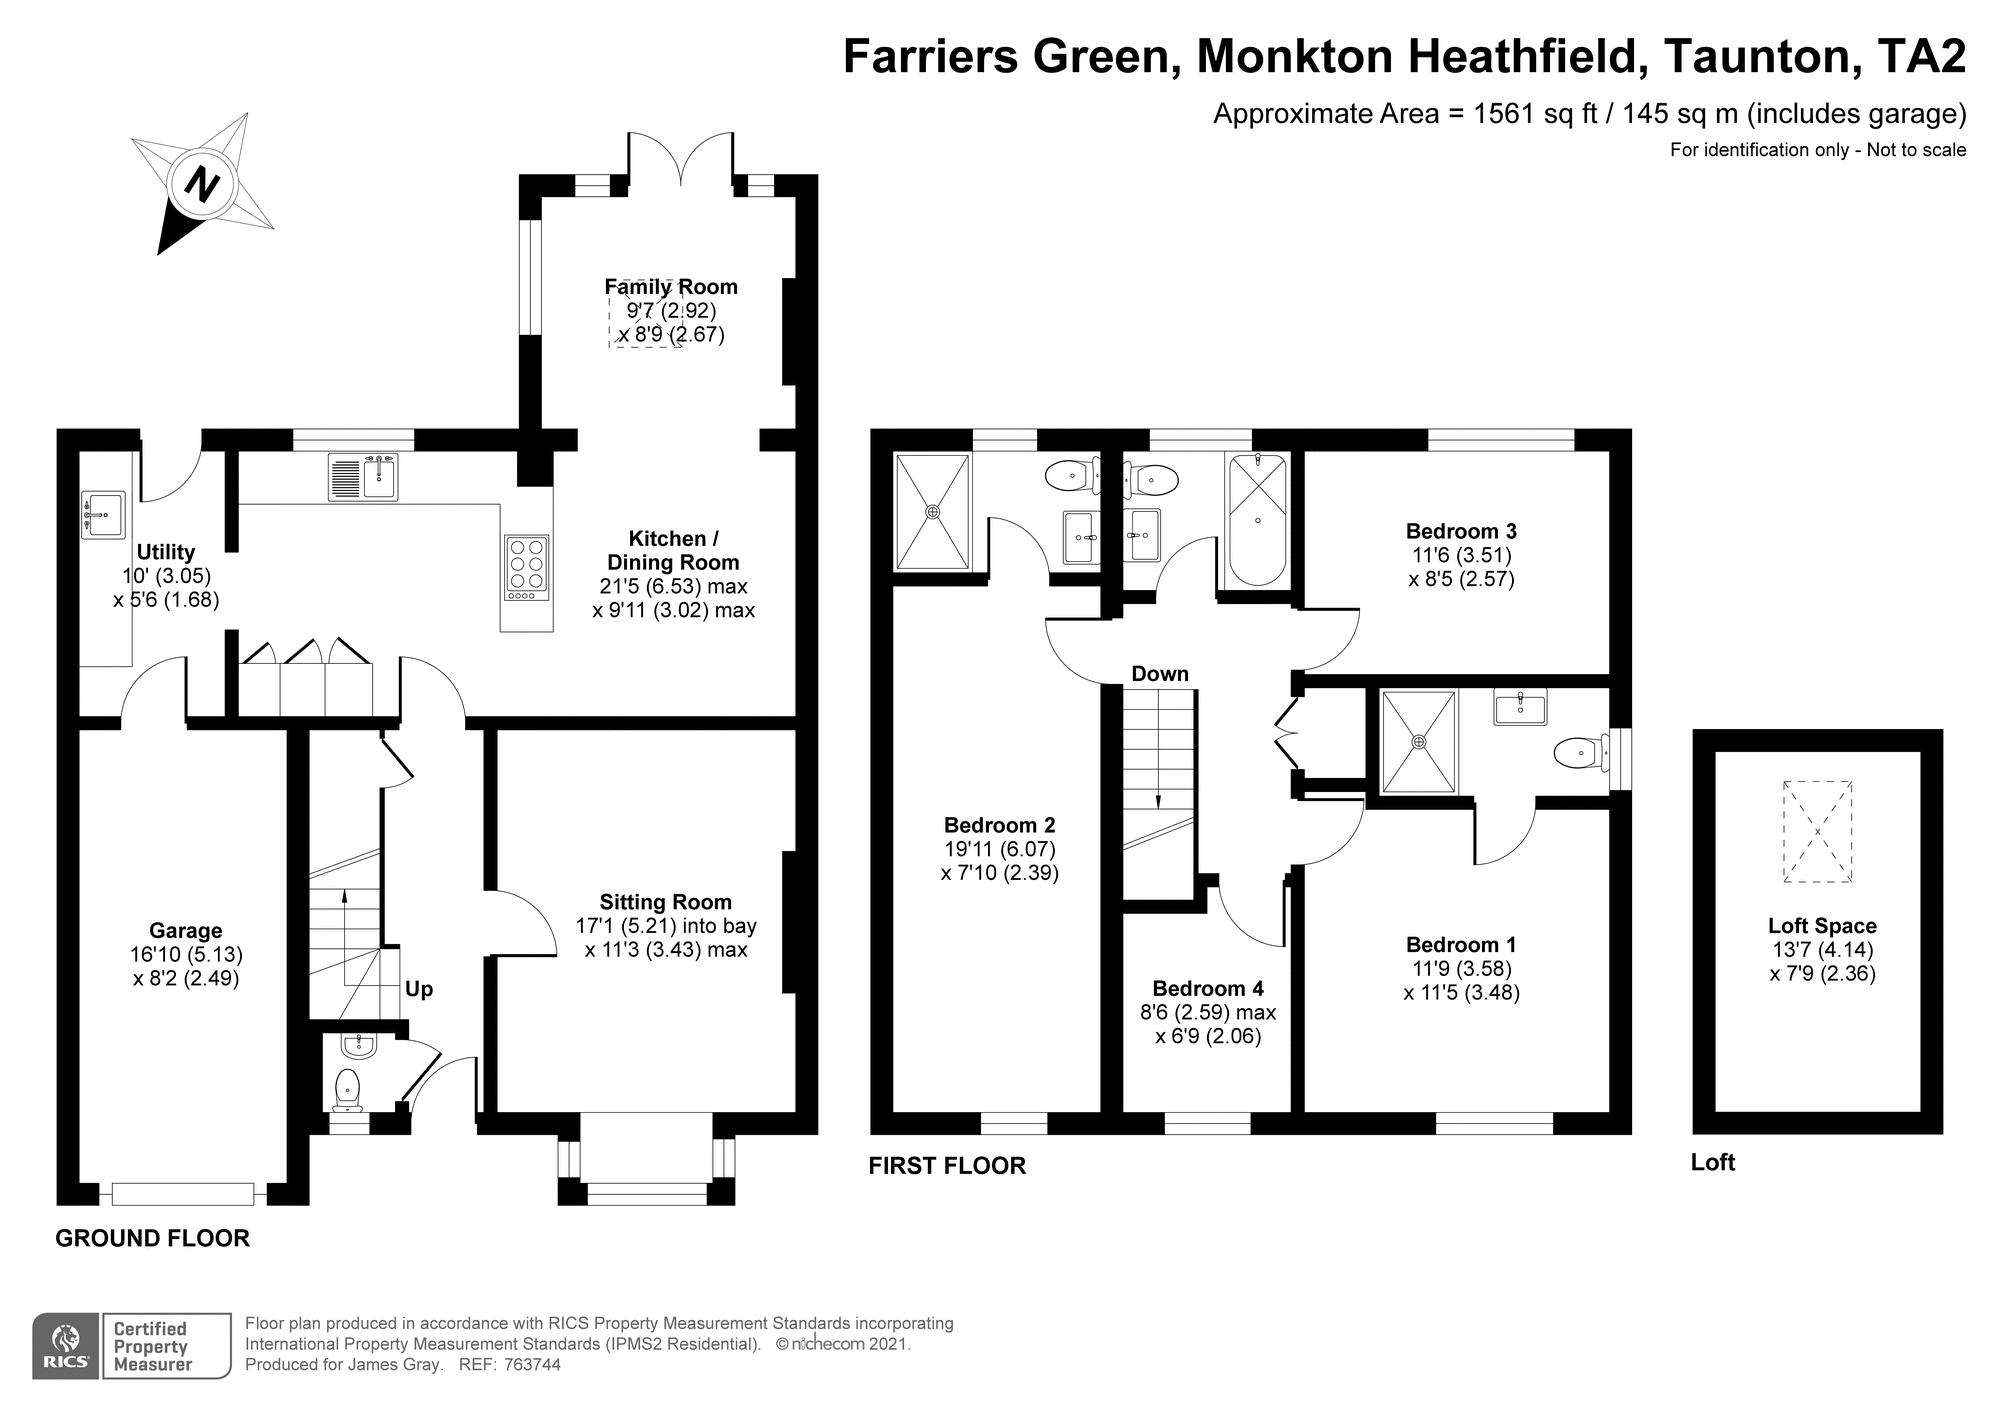 Farriers Green Monkton Heathfield